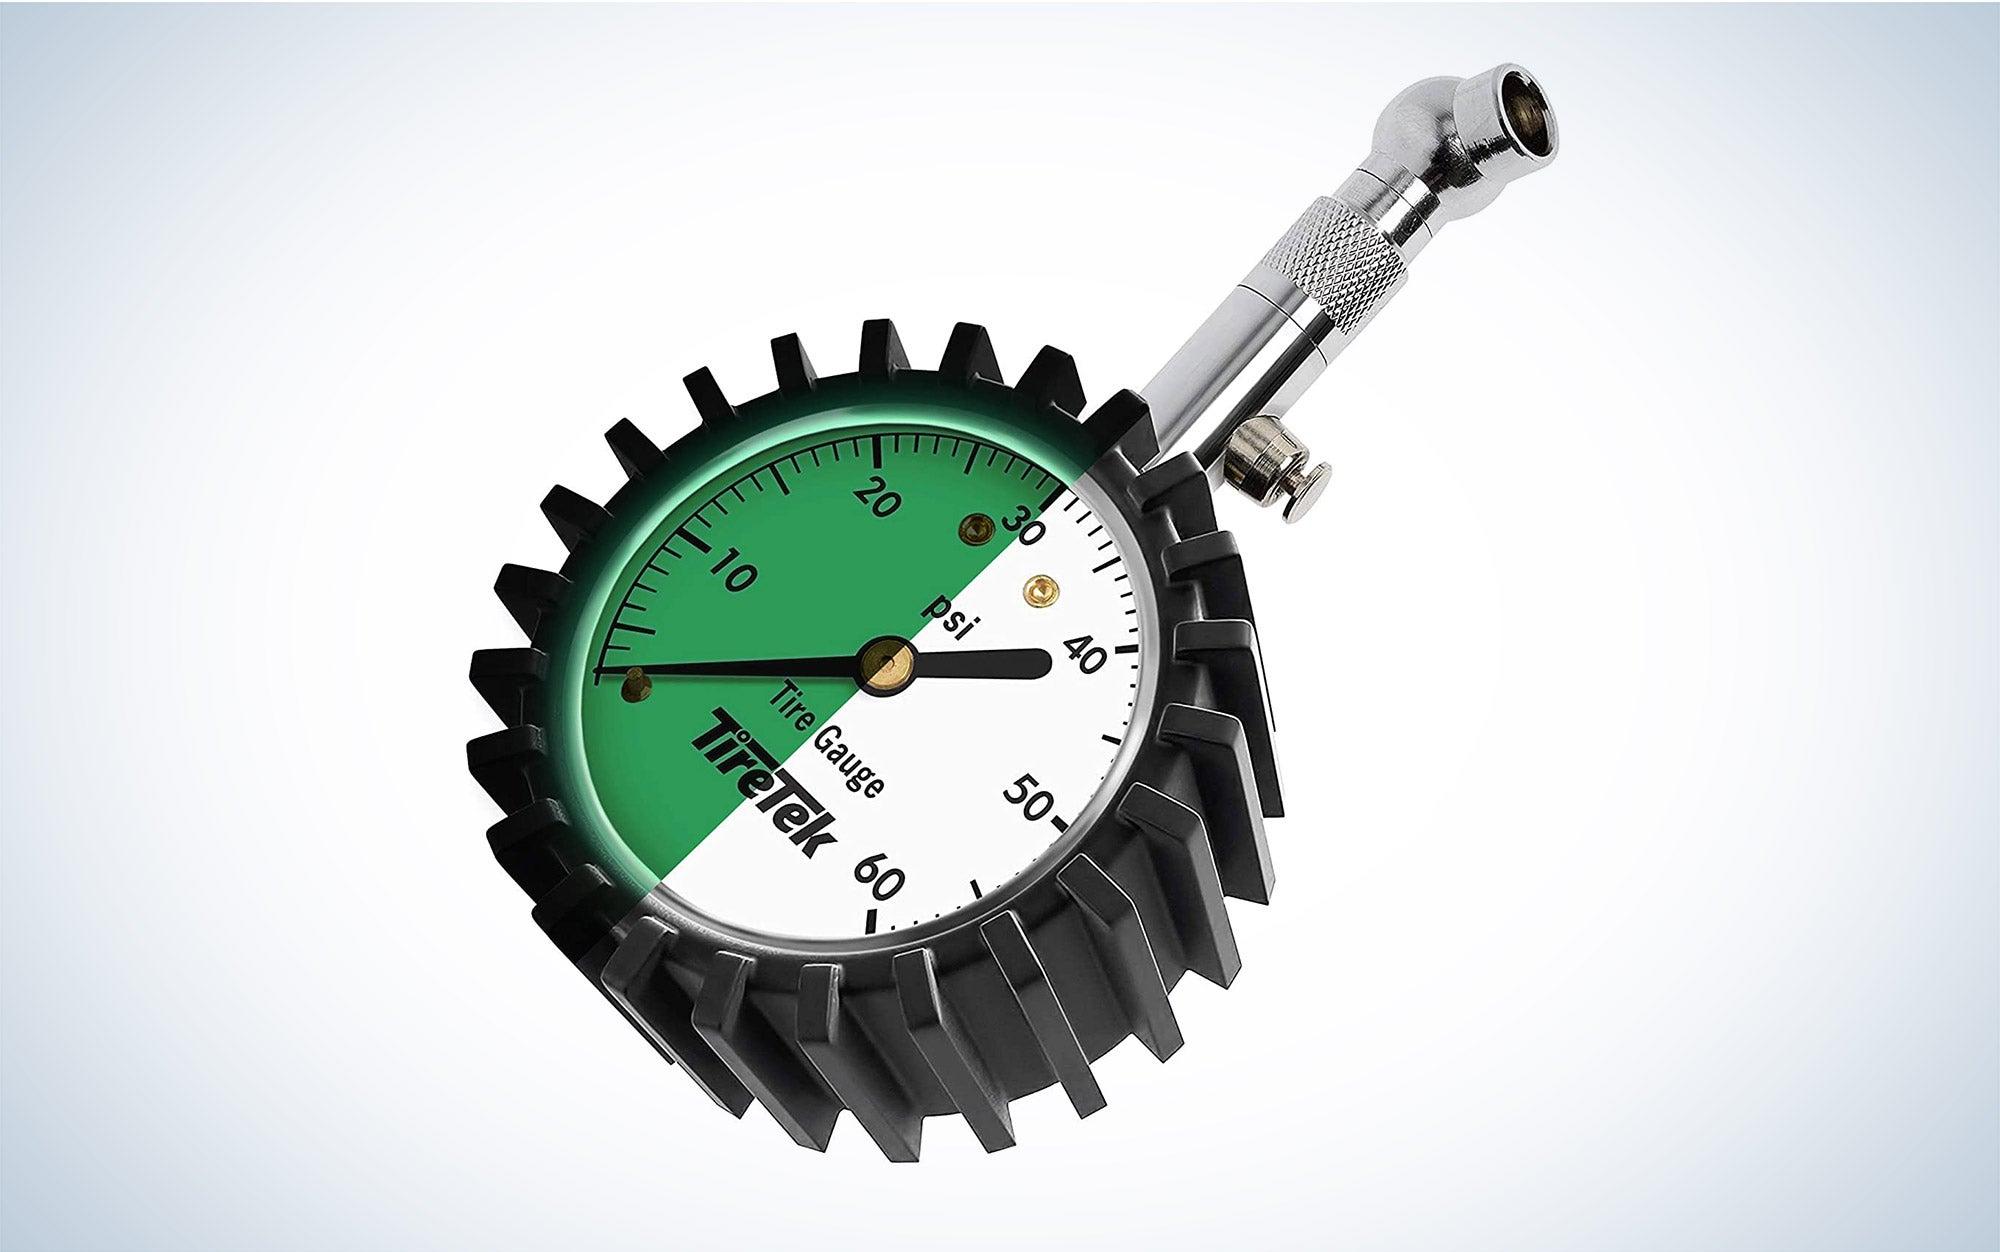 tire pressure gauge for car